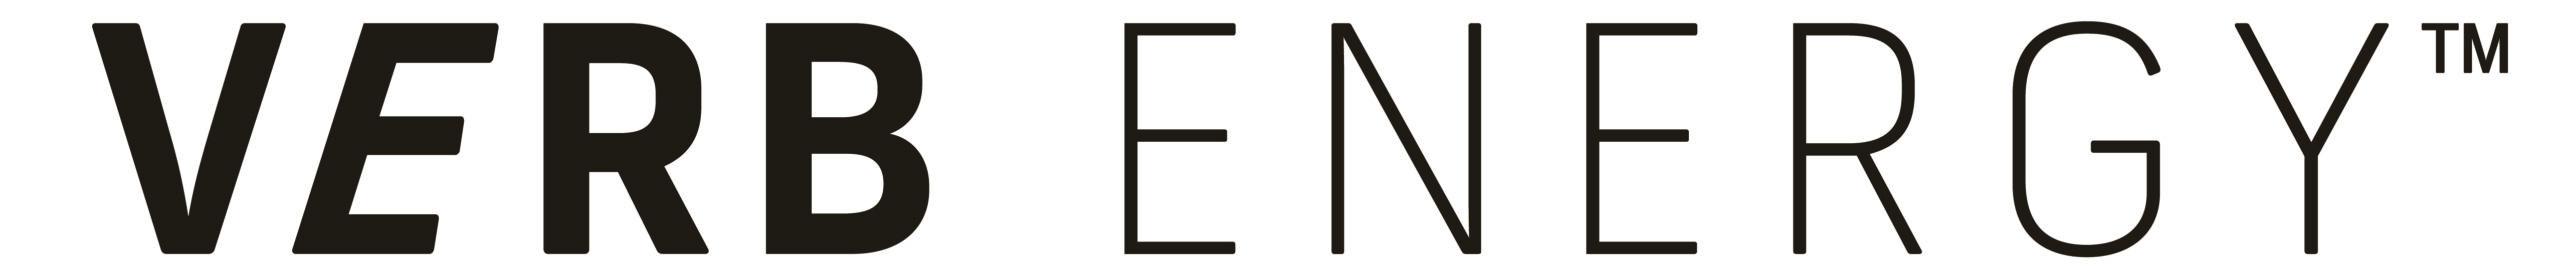 VerbEnergy logo